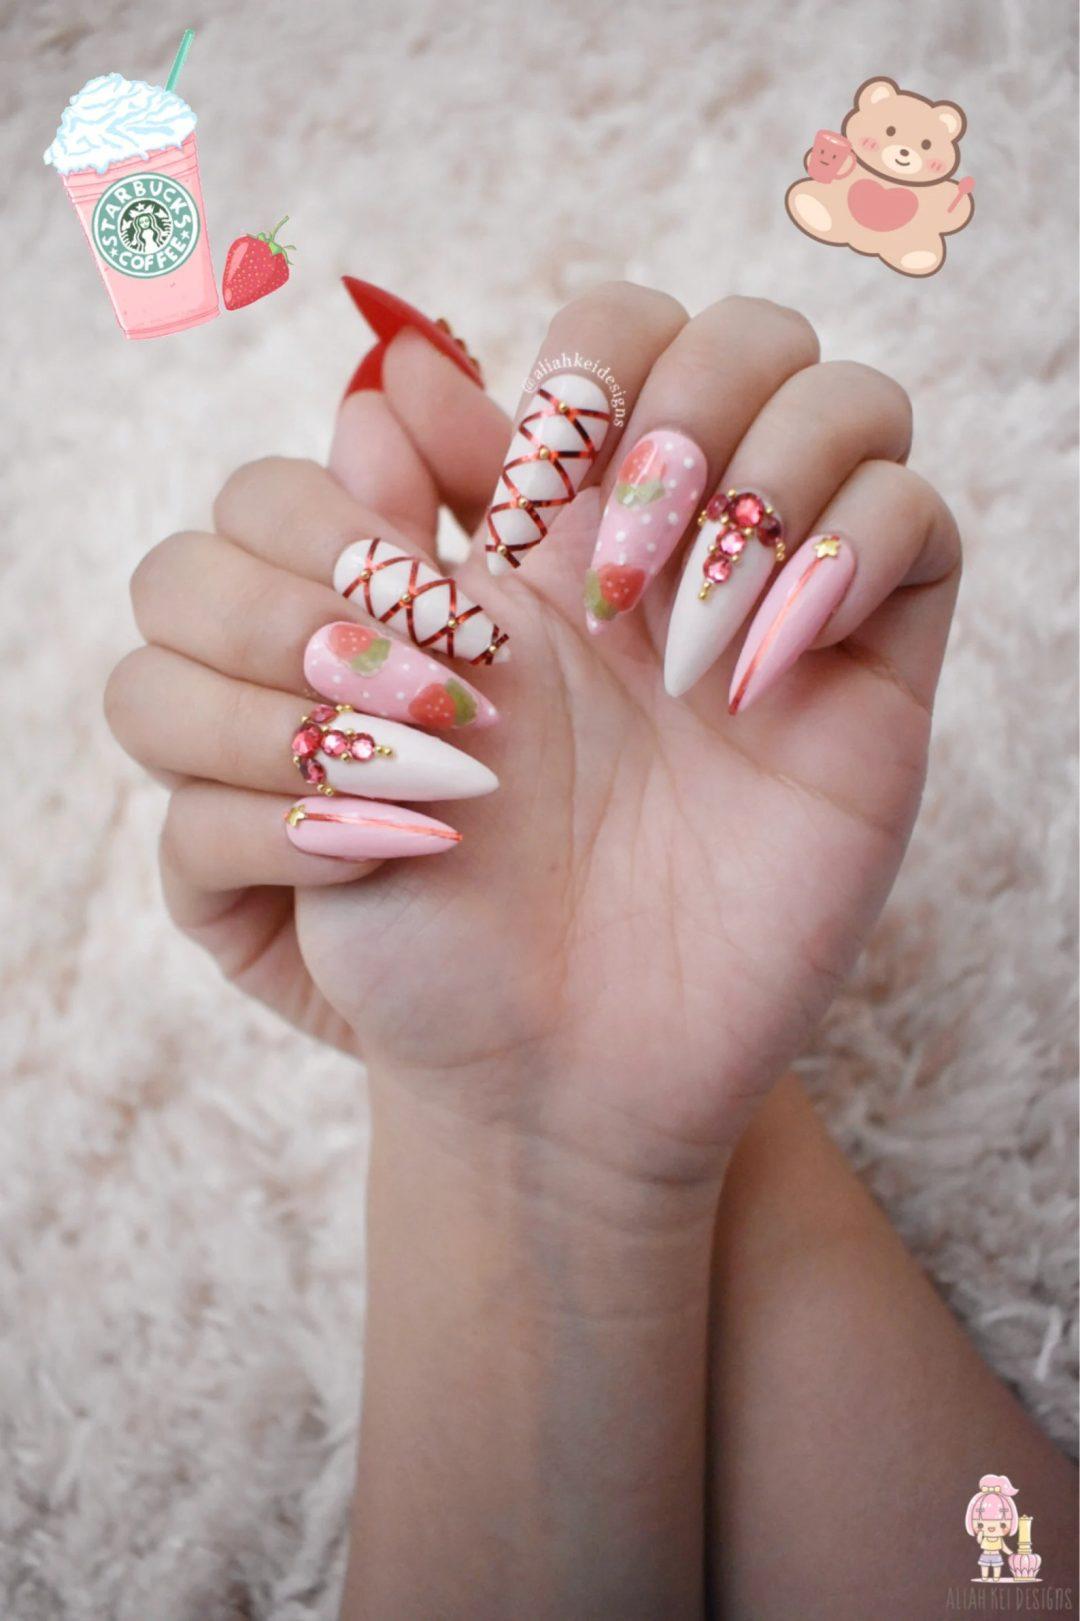 Strawberry milkshake fruit nails